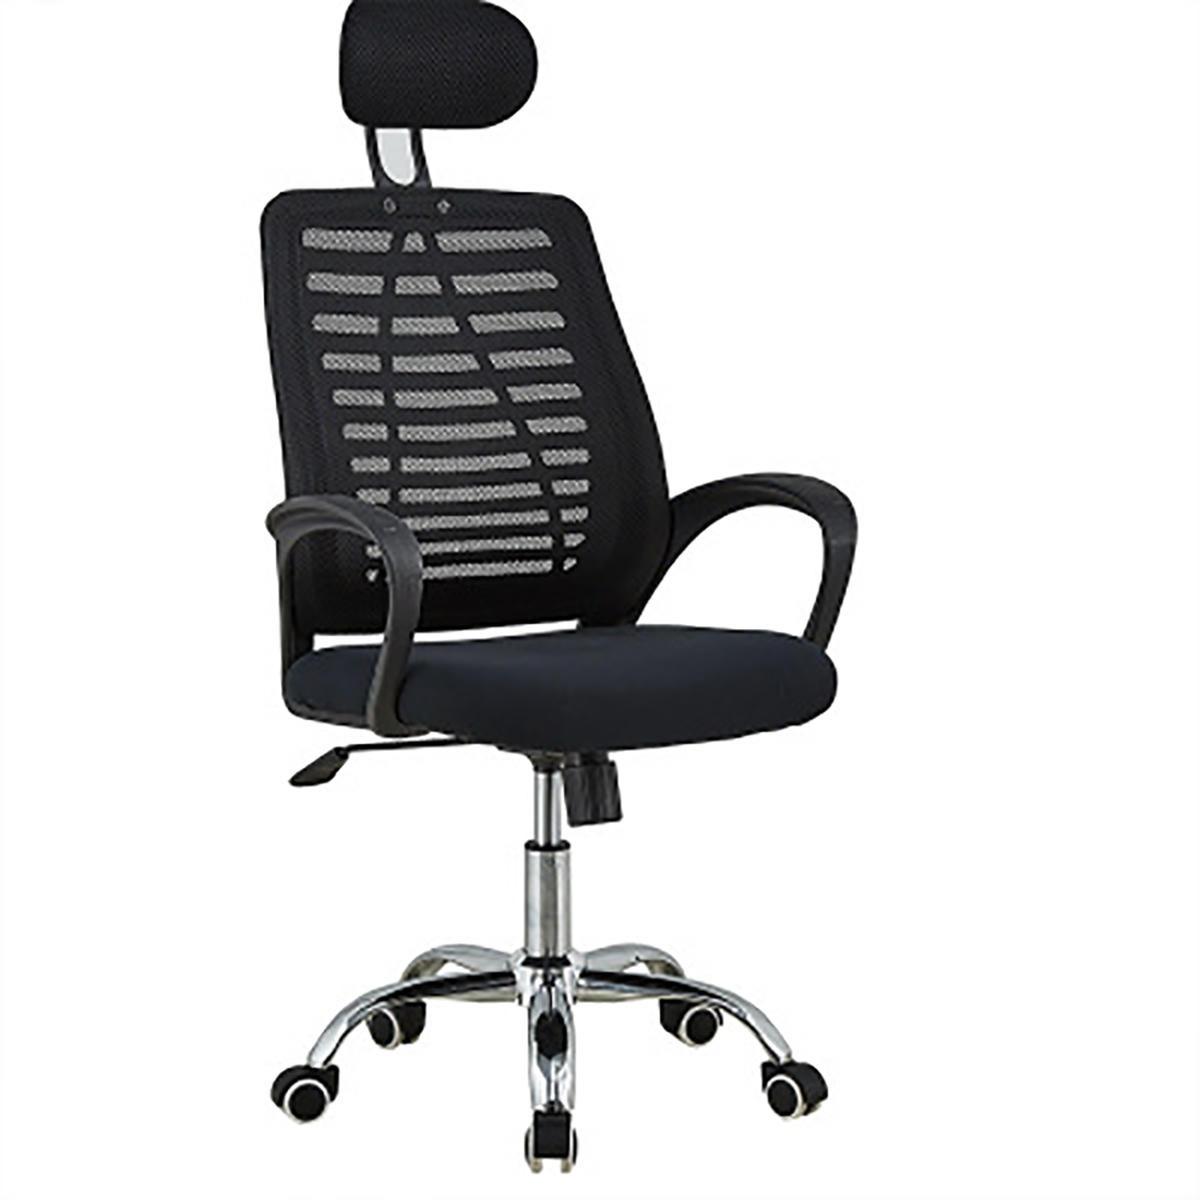 Mesh Backchair Office Executive High Back Ergonomisk dator Bärbar dator Skrivbord Sitspall Justerbar